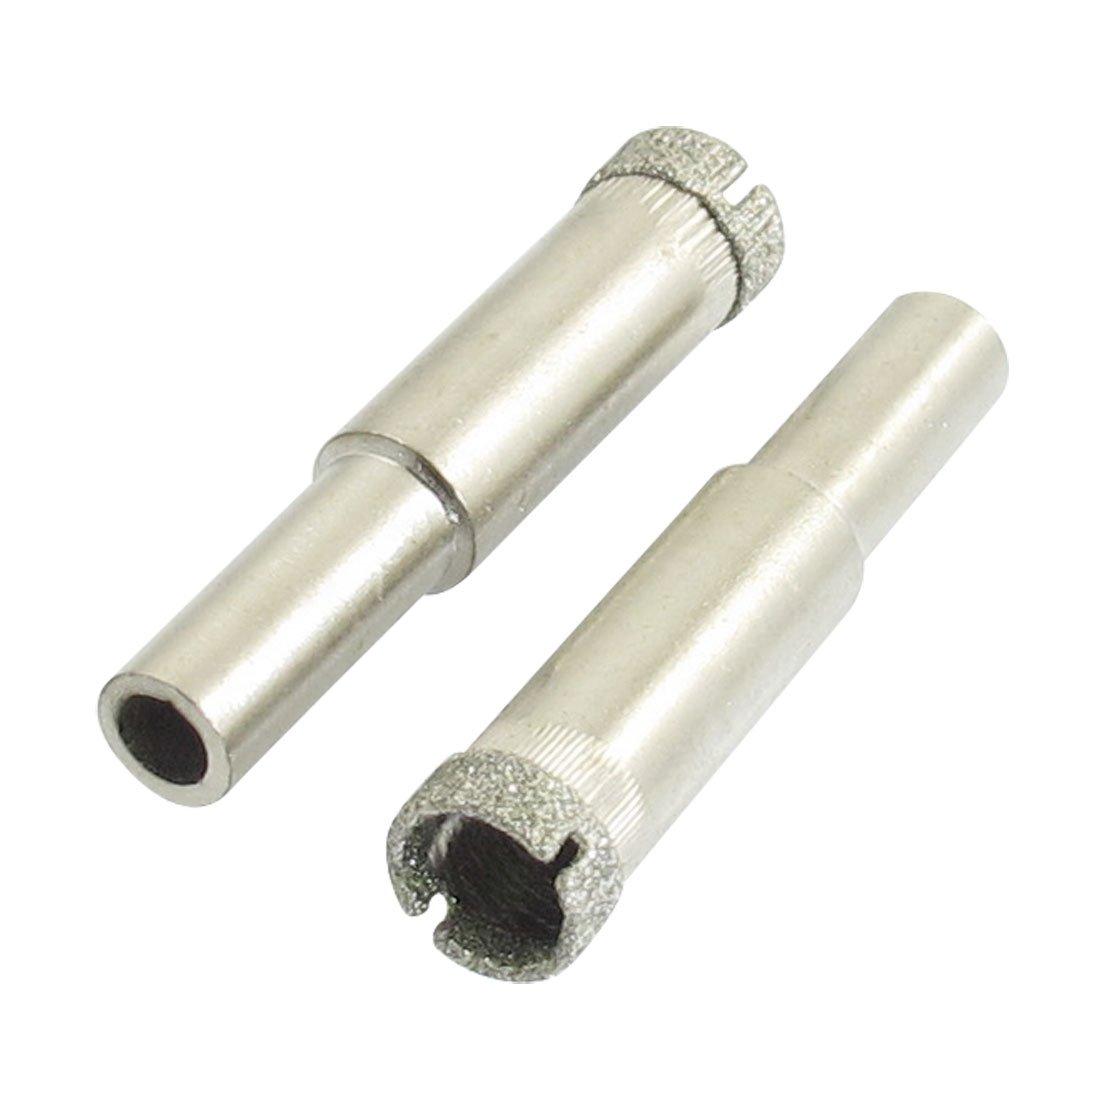 2 Pcs 100mm Diamond Drill Bits Set Hole Saw Cutter Tool Glass Marble Granite